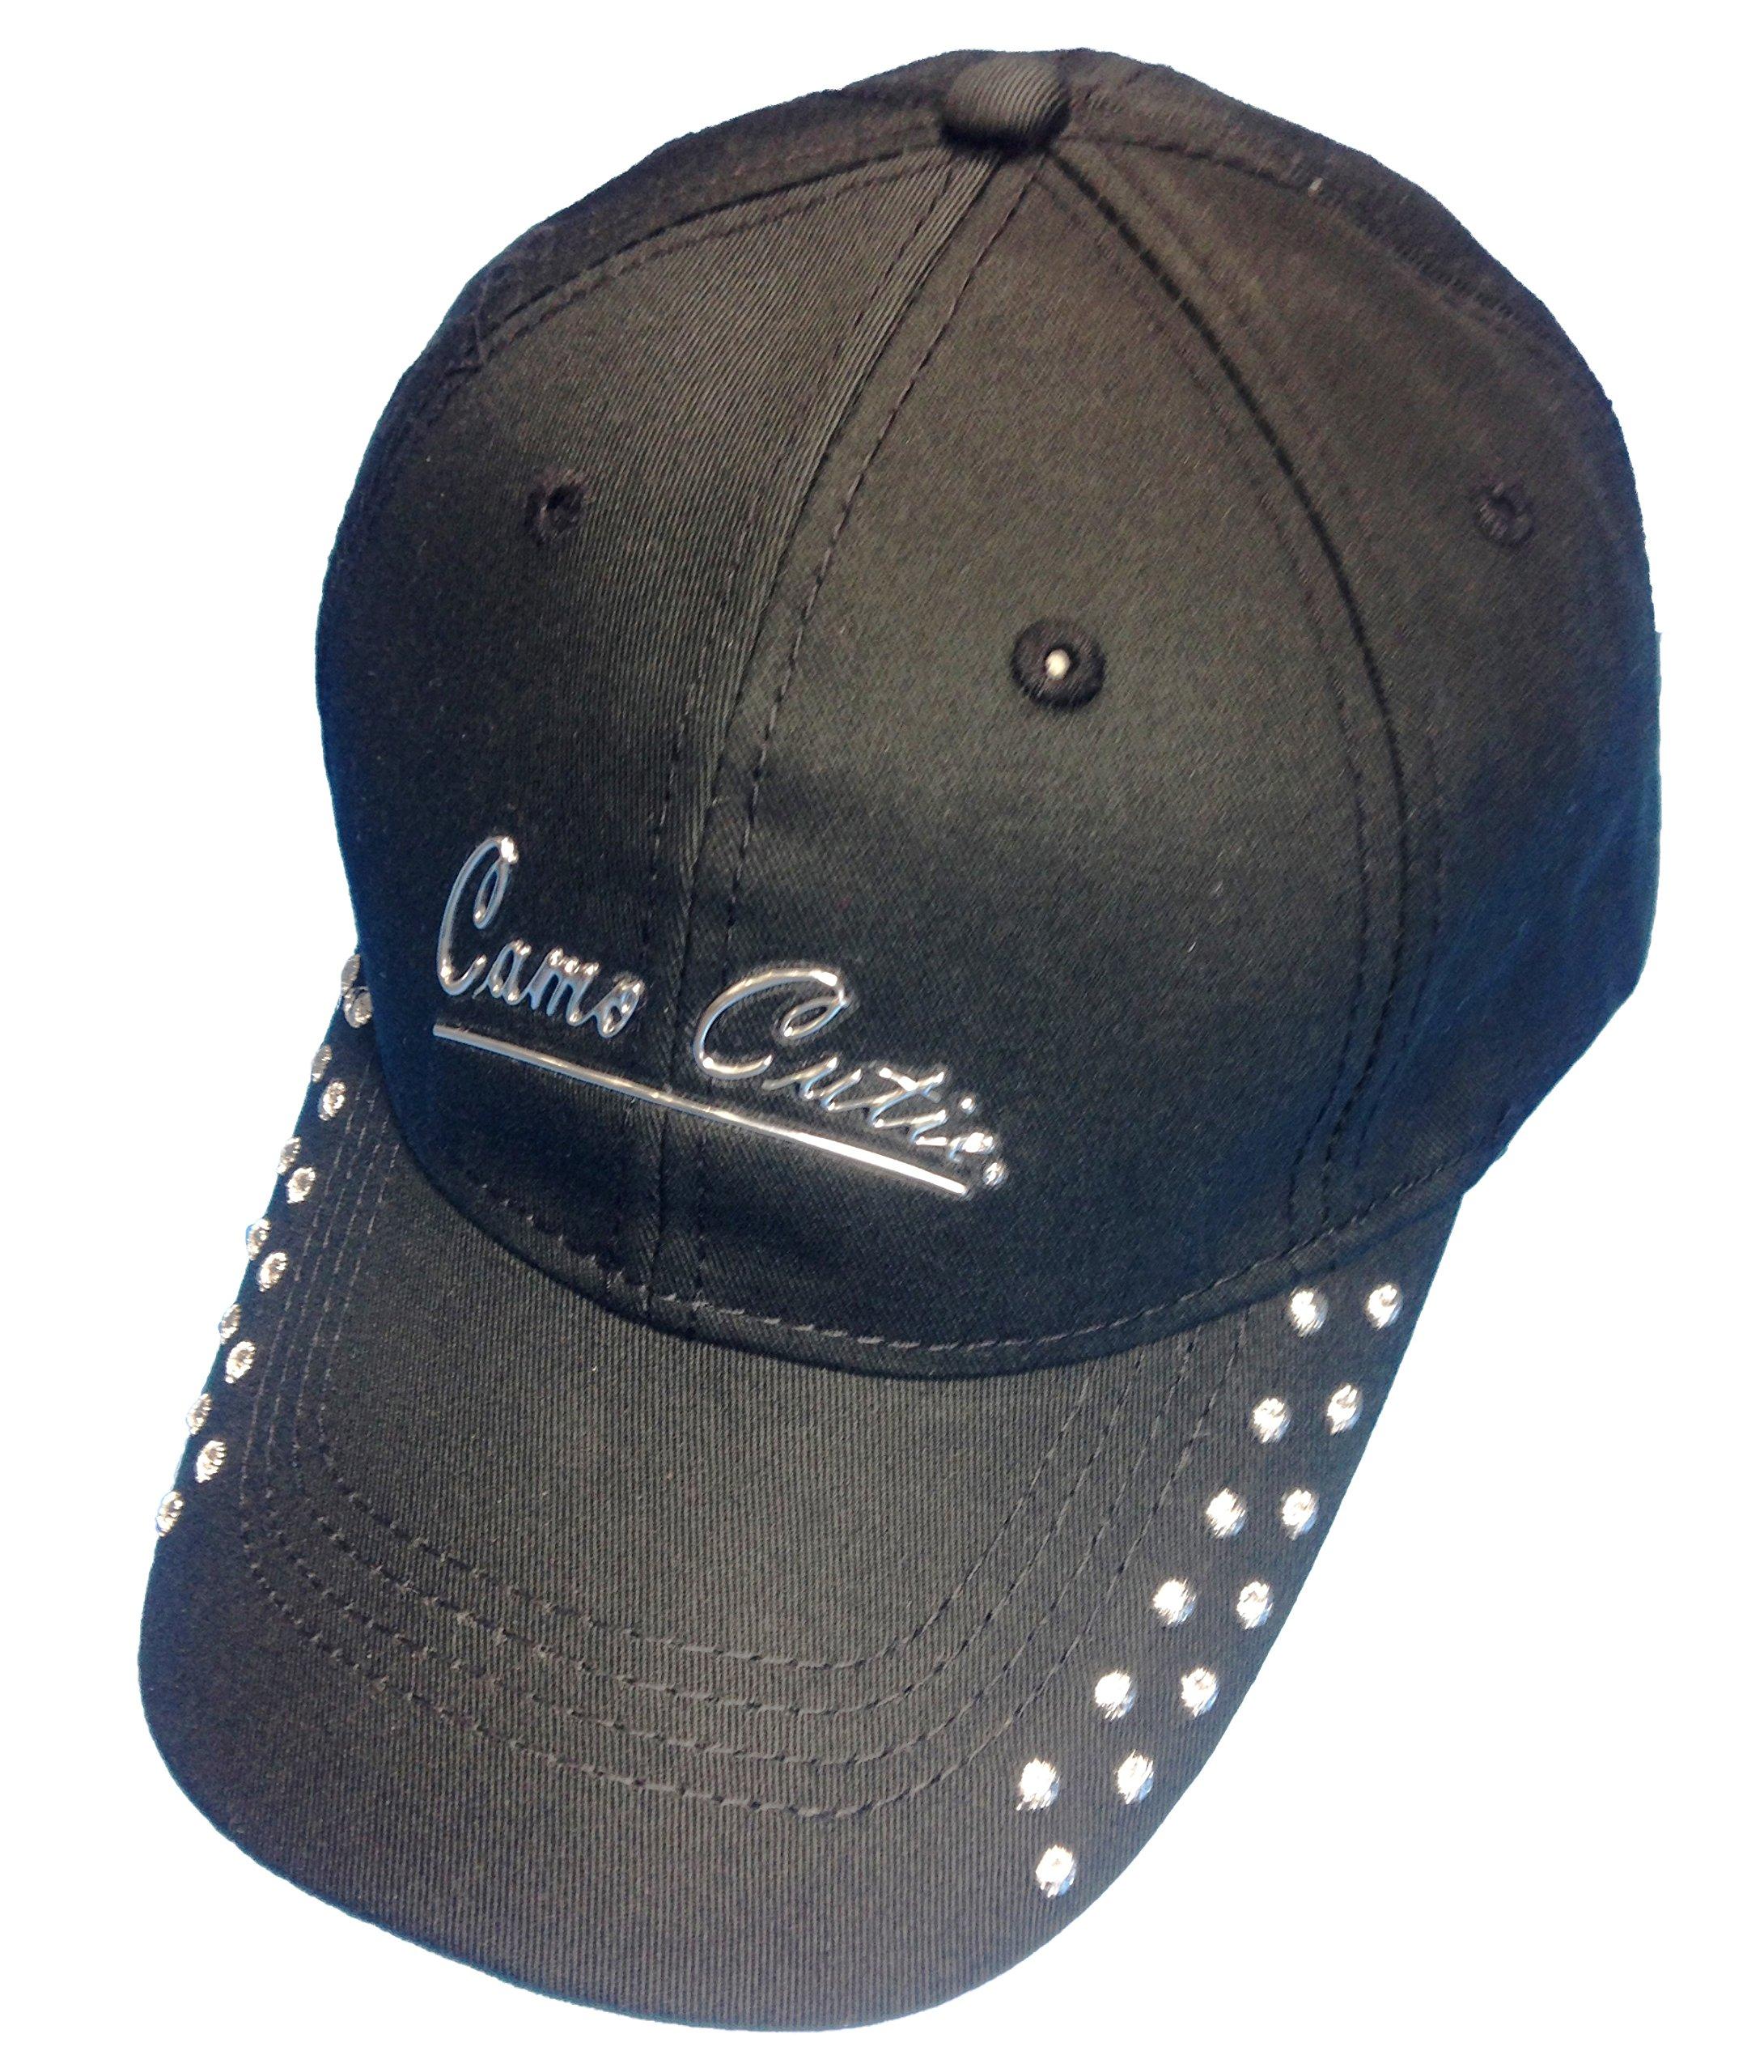 Womens Camo Cutie Black cap